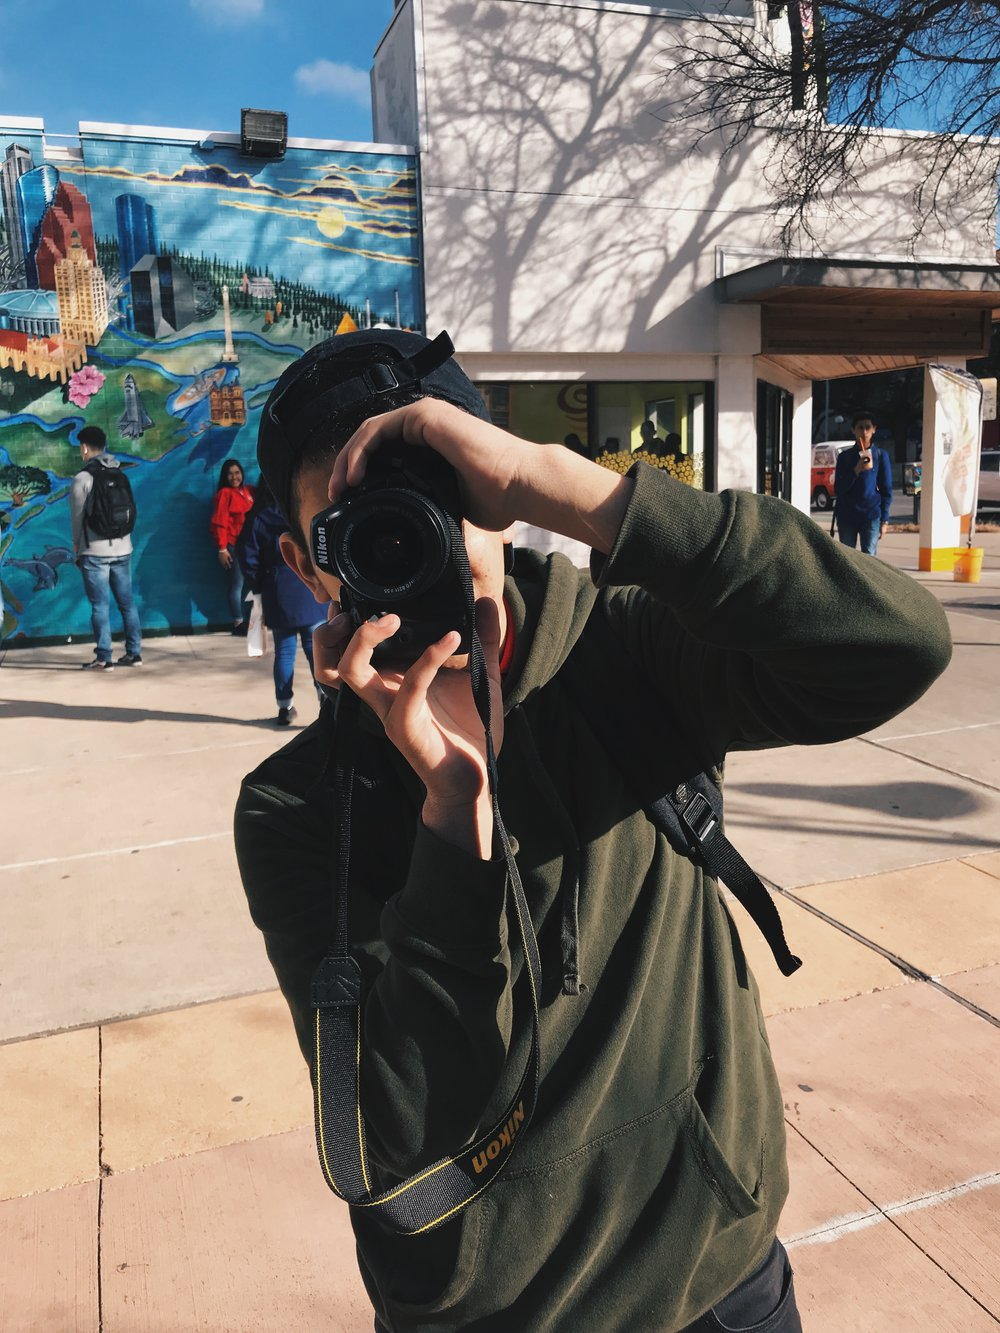 EDUARDO TREVIÃ'O | PHOTOGRAPHER - PORTRAIT / FILMMAKER